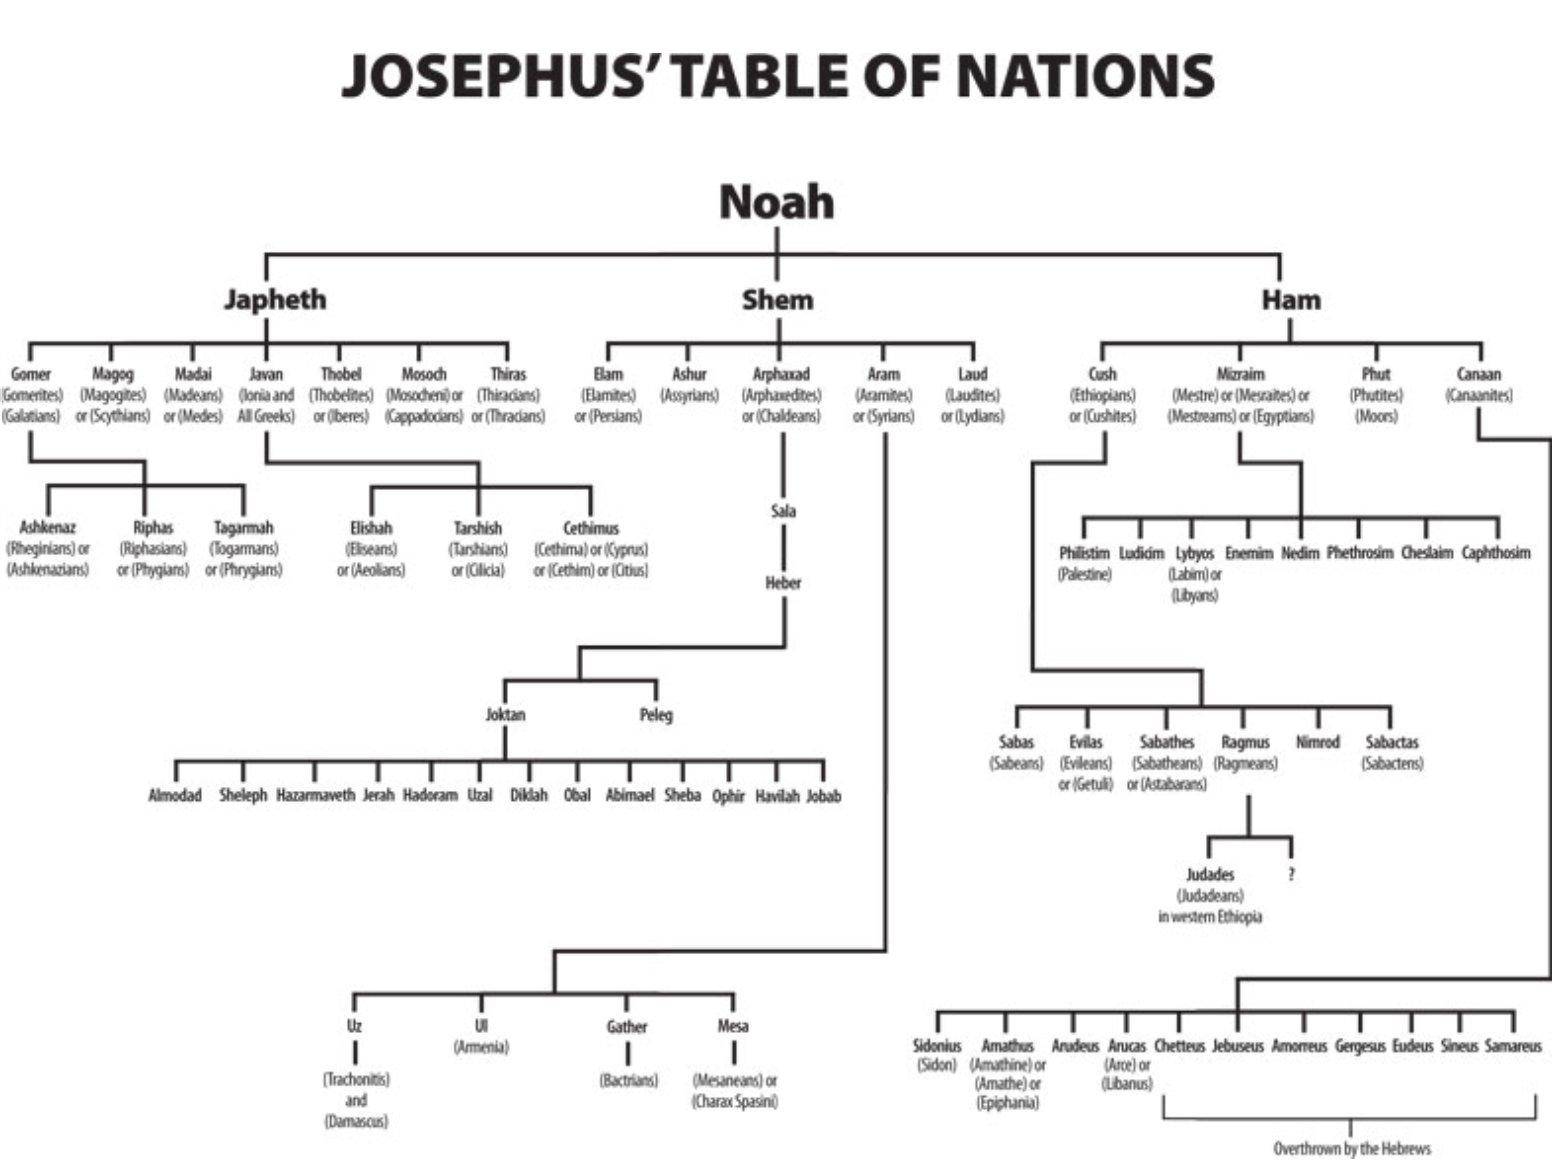 Josephus' Table of Nations